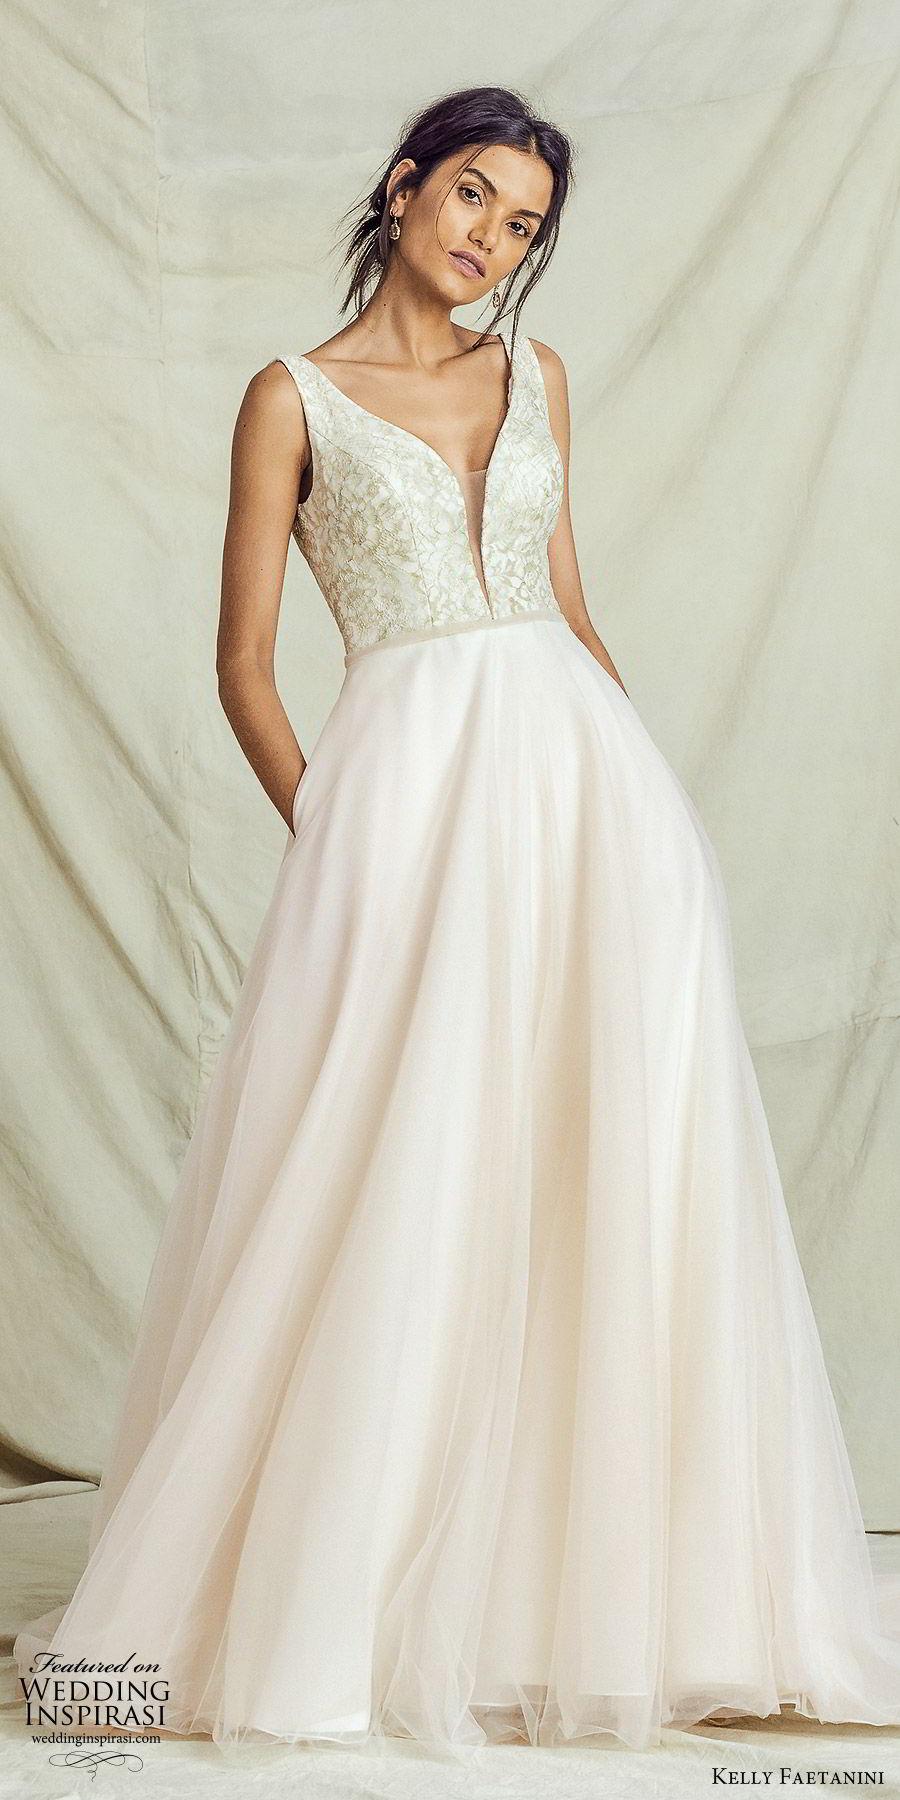 kelly faetanini fall 2019 bridal sleeveless thick straps plunging neckline lace bodice a line ball gown wedding dress vback chapel train romantic blush (9) mv